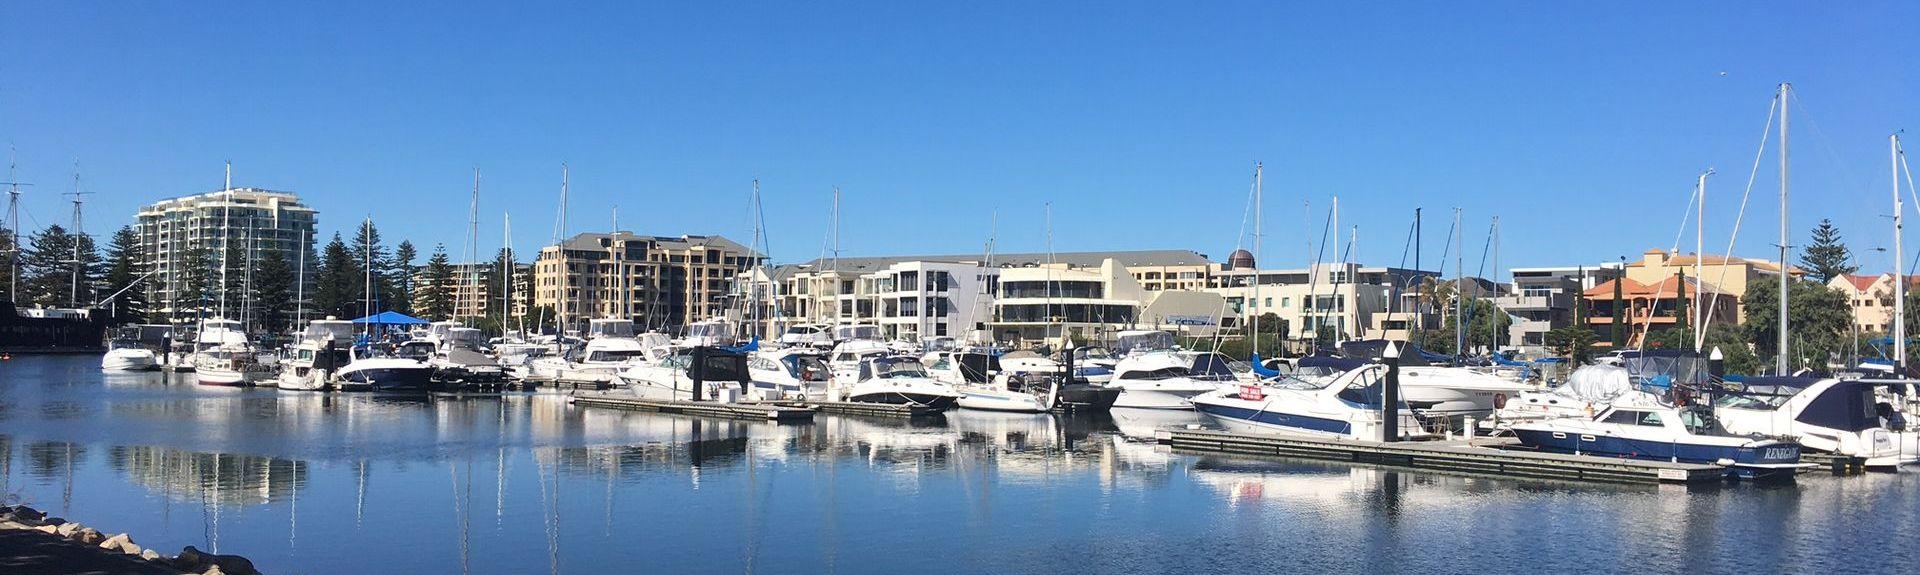 Findon, Adelaide, South Australia, Australia